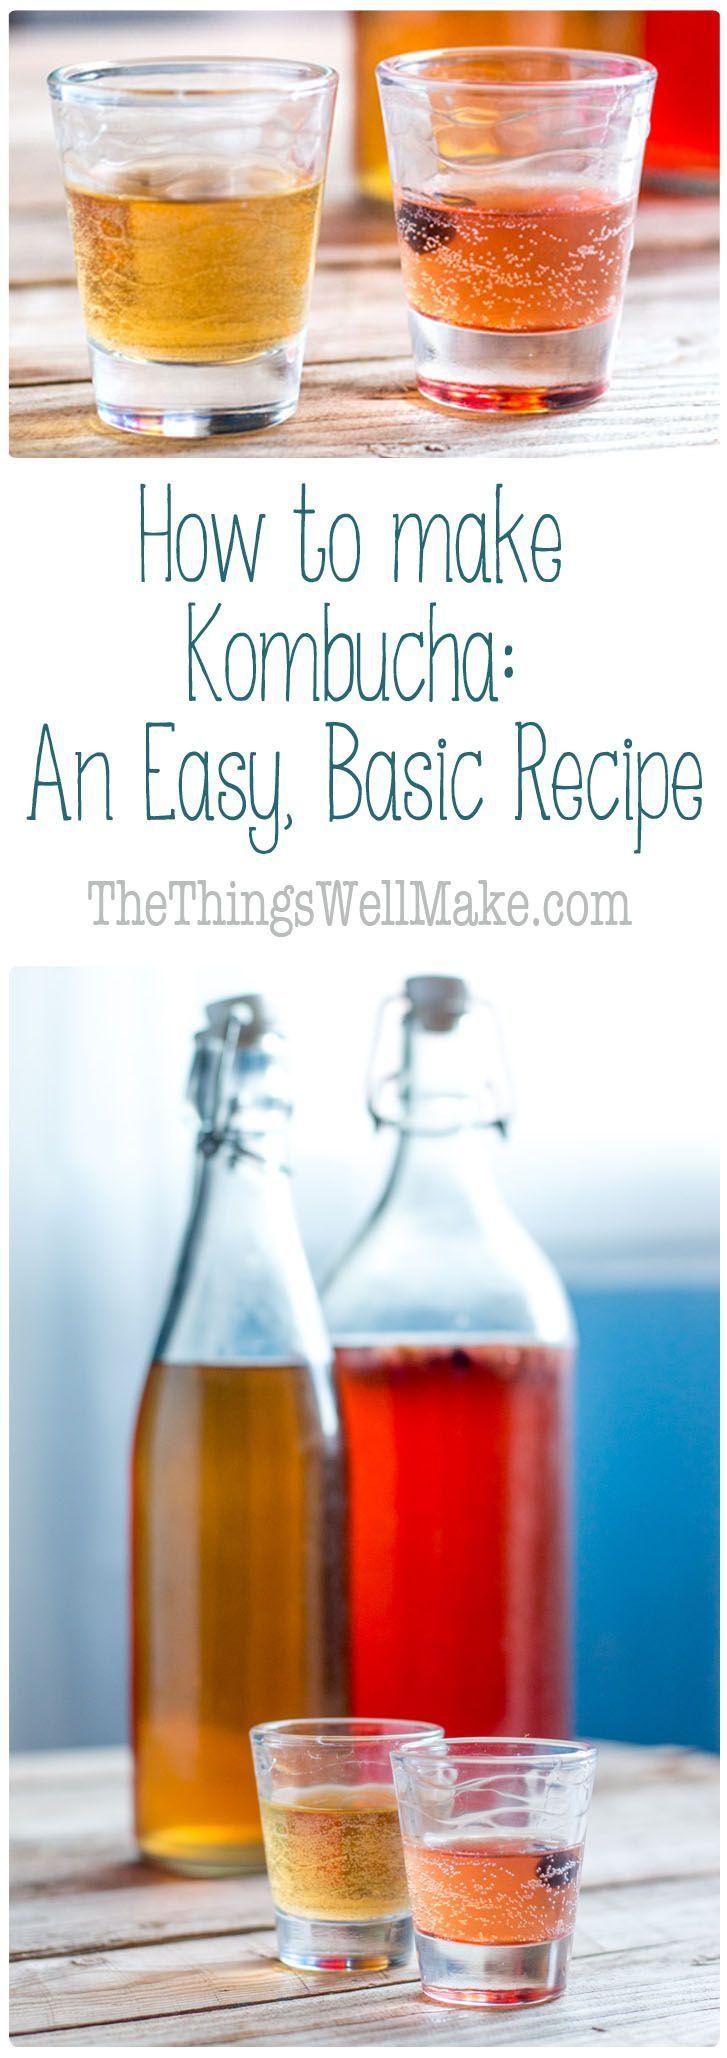 Best 10+ Kombucha drink ideas on Pinterest   Kombucha probiotic ...